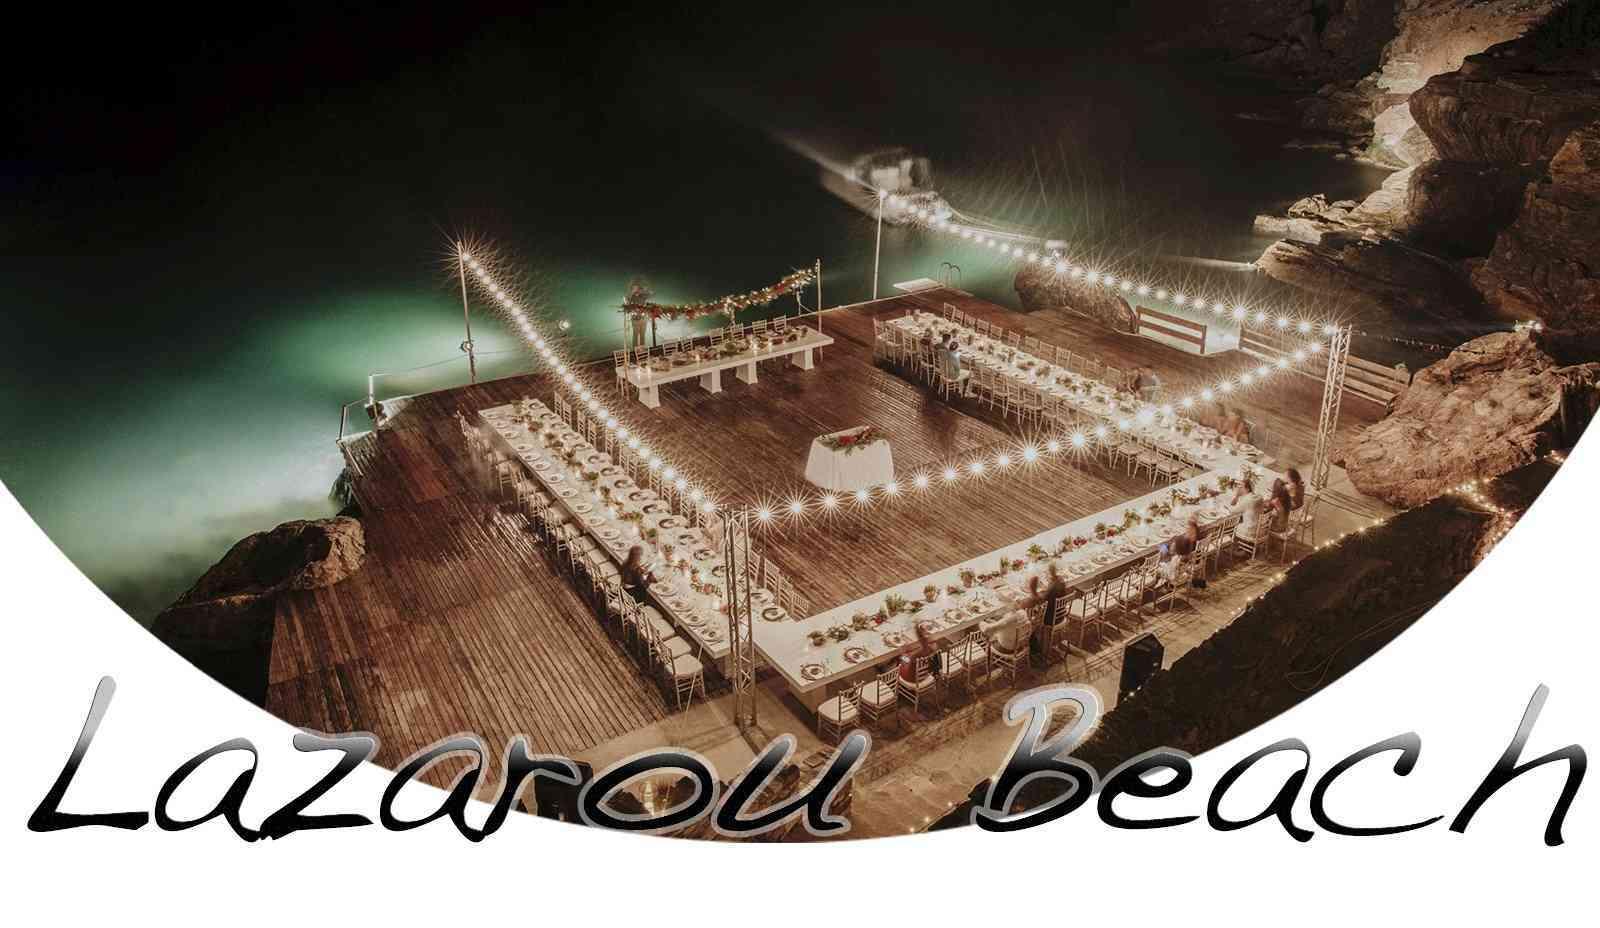 LAZAROU BEACH1